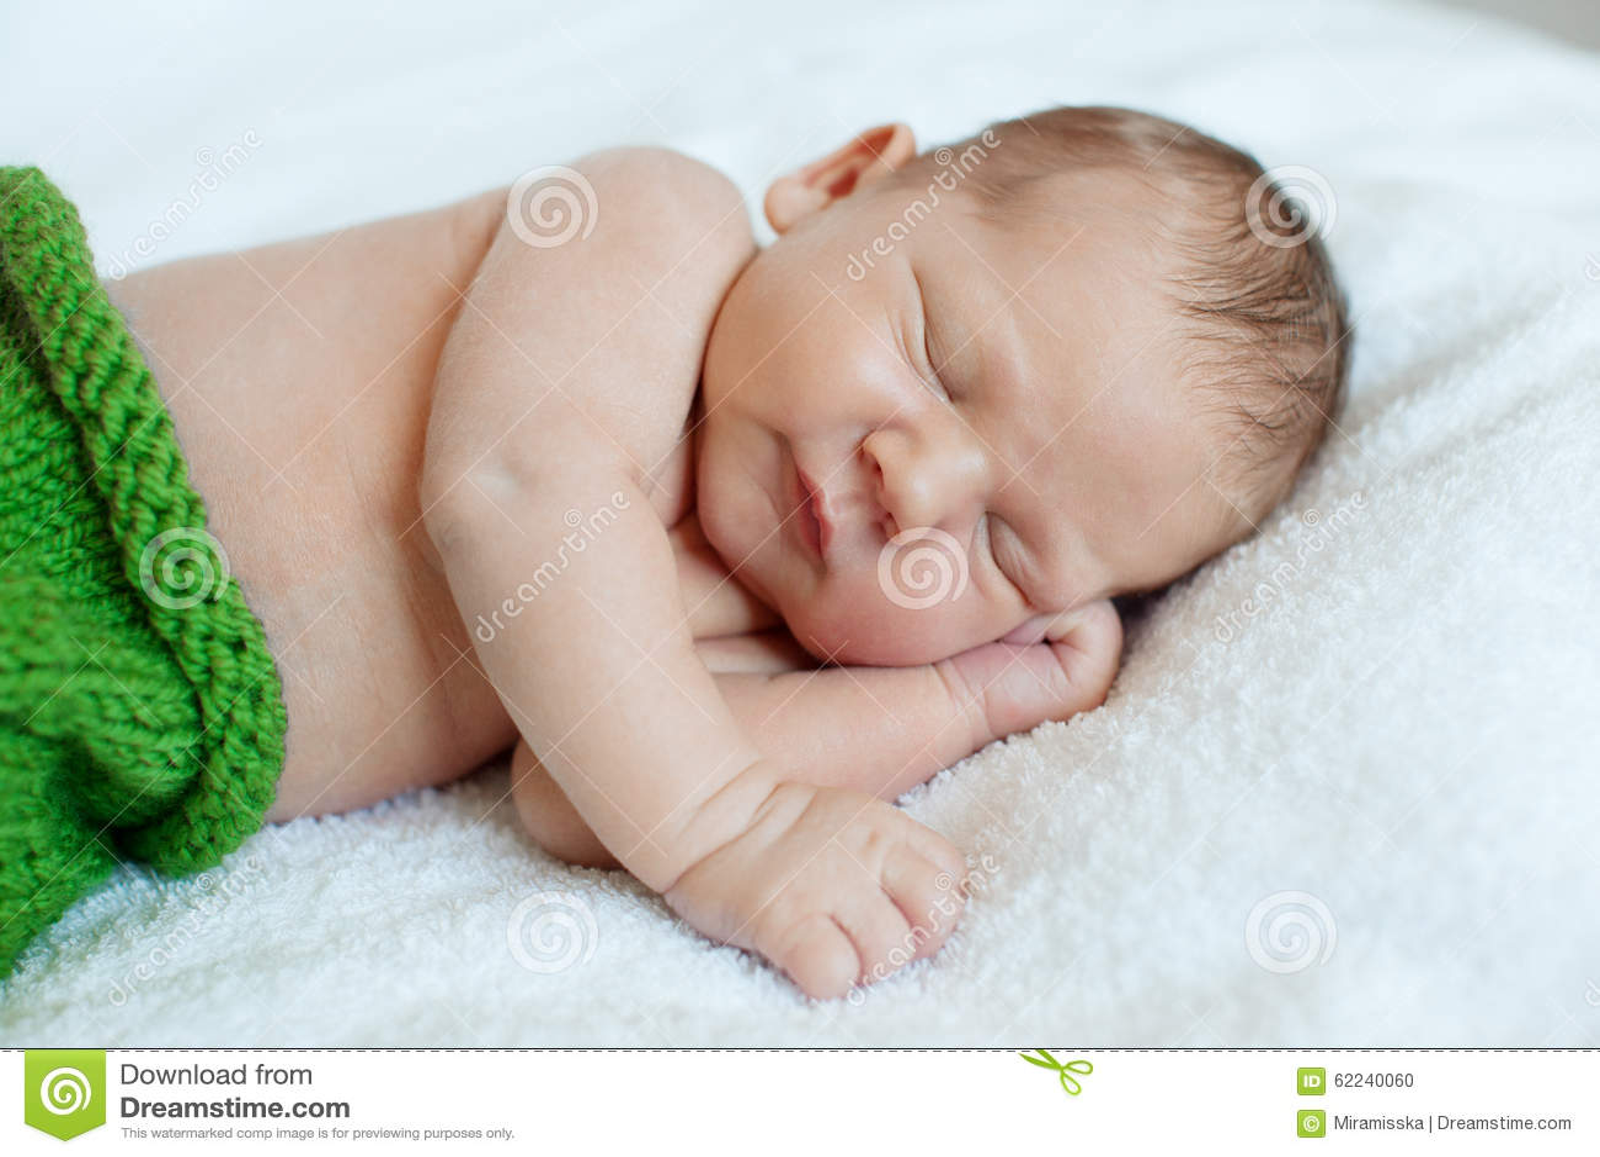 Baby sleeping. Newborn, kid art. Beauty child, boy or girl sleep